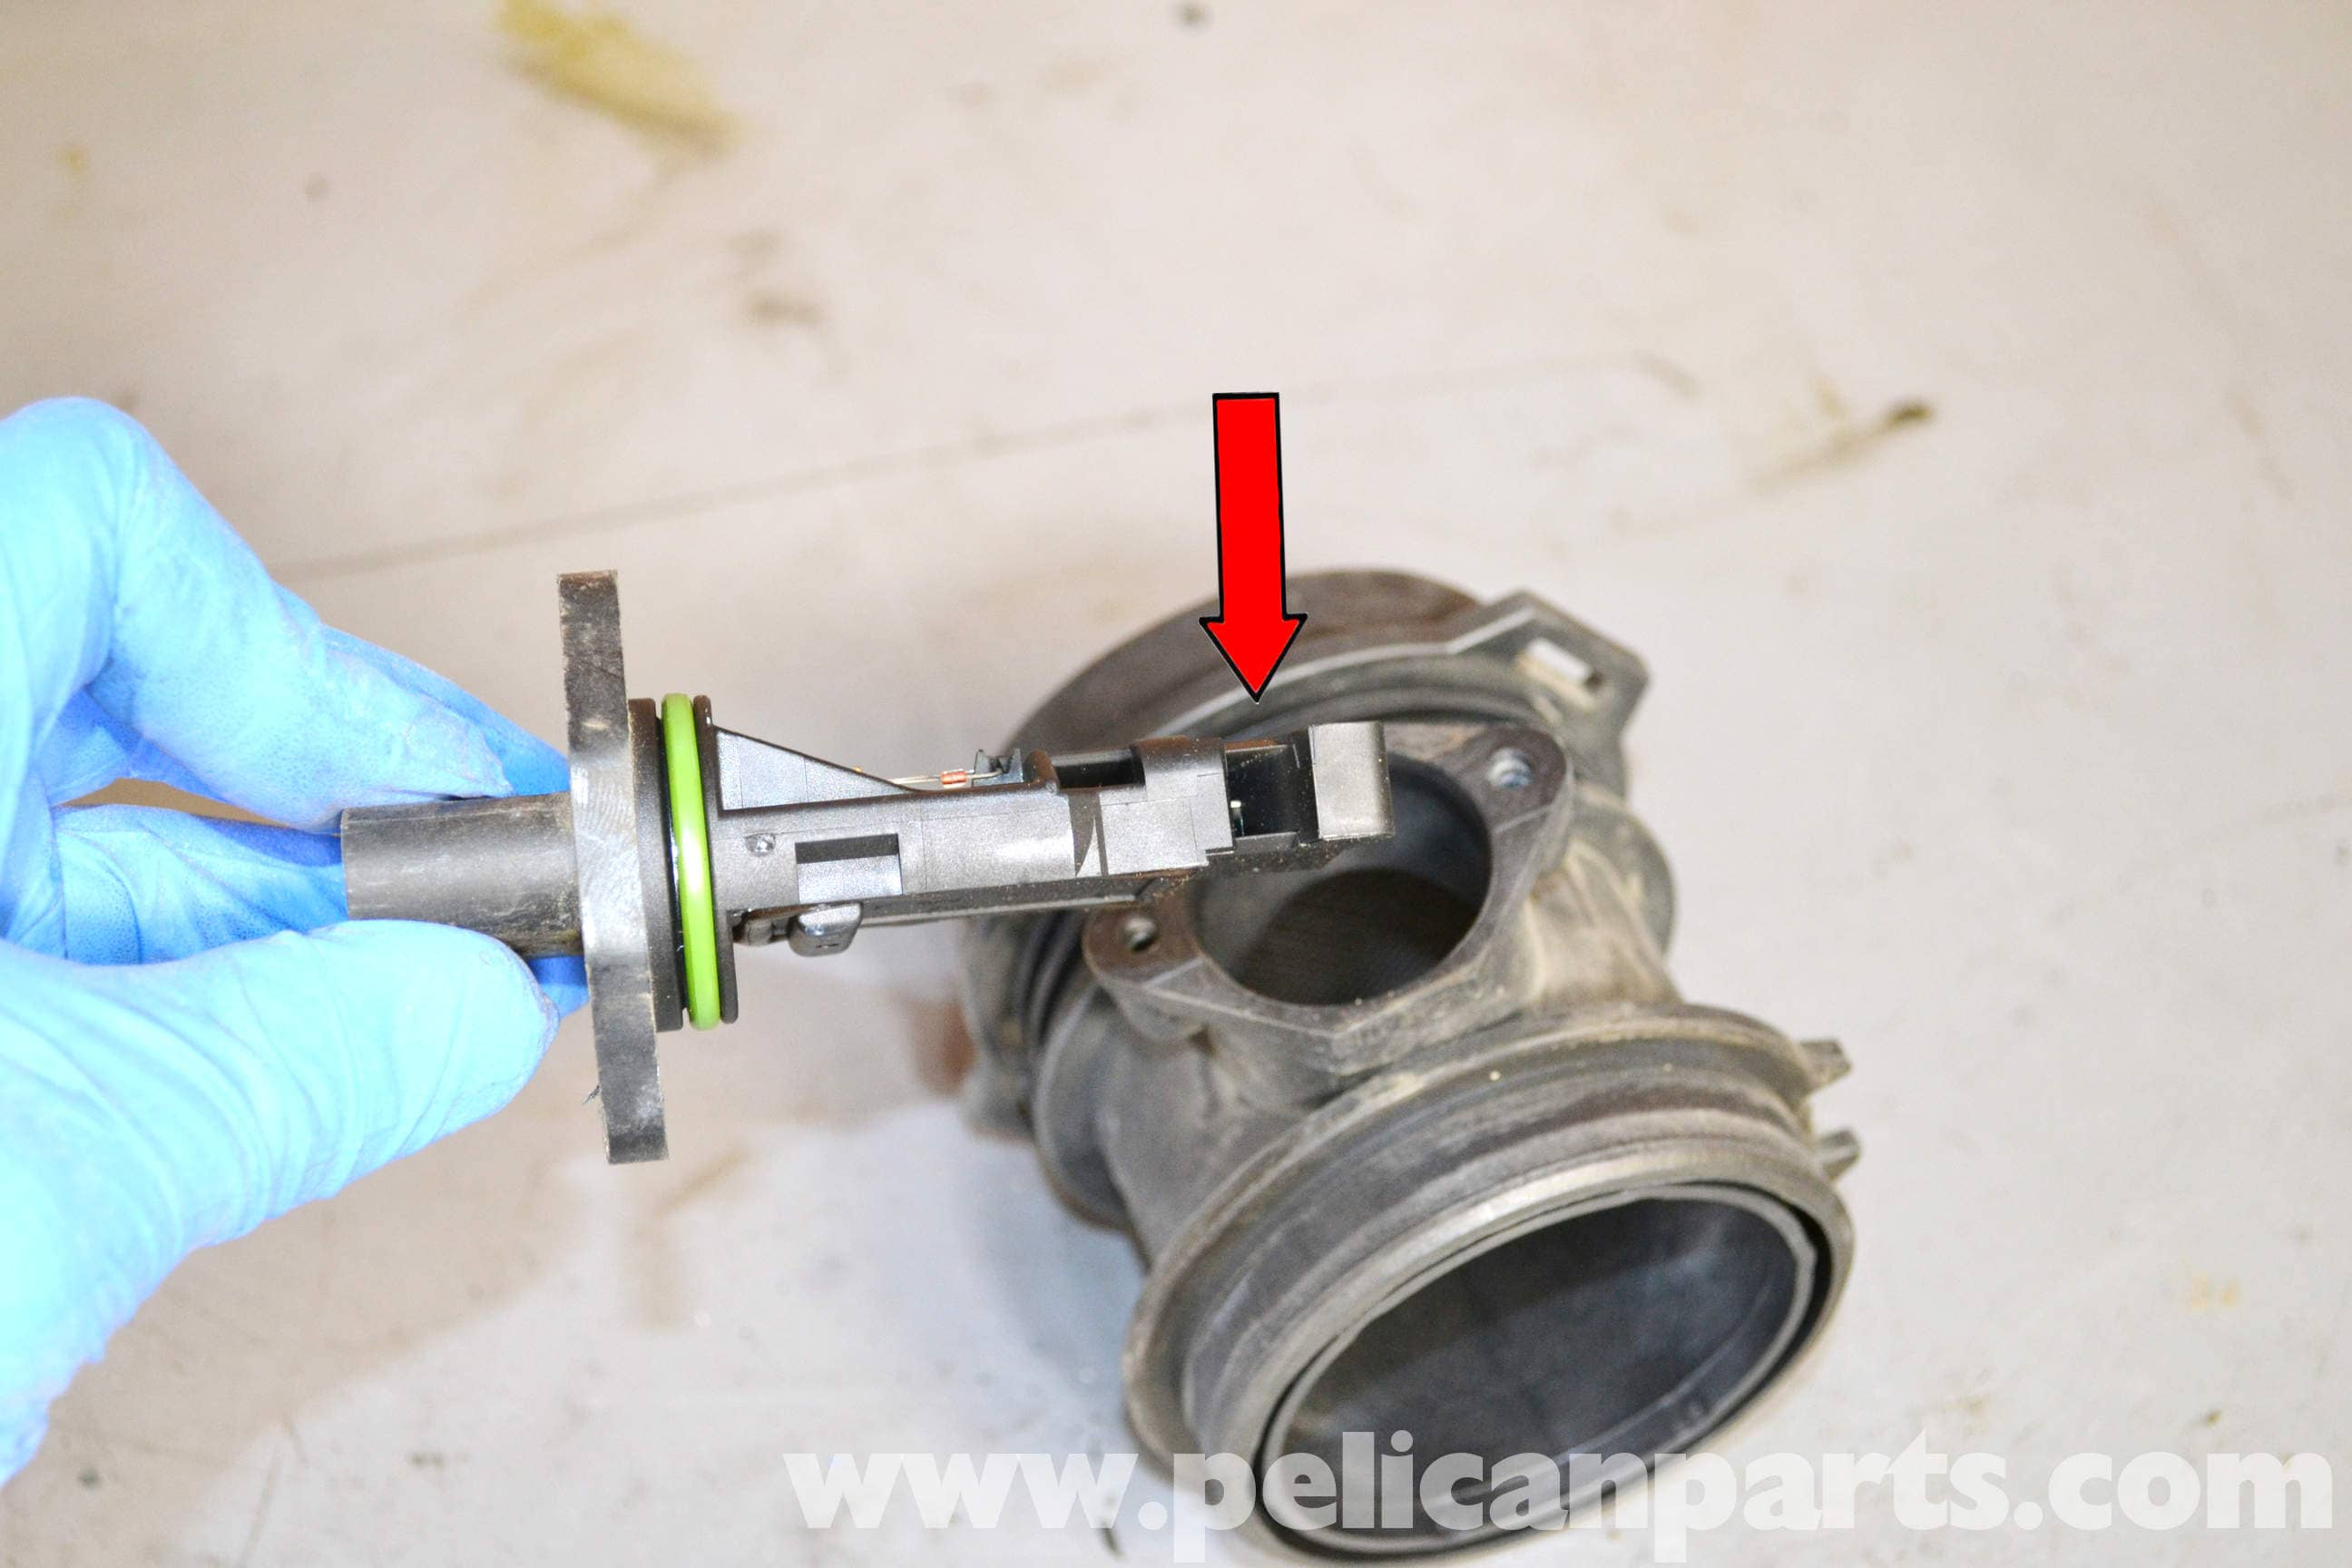 Mercedes Benz W203 Maf Mass Air Flow Sensor Replacement 2001 2003 Dodge Ram Wiring Diagram Large Image Extra